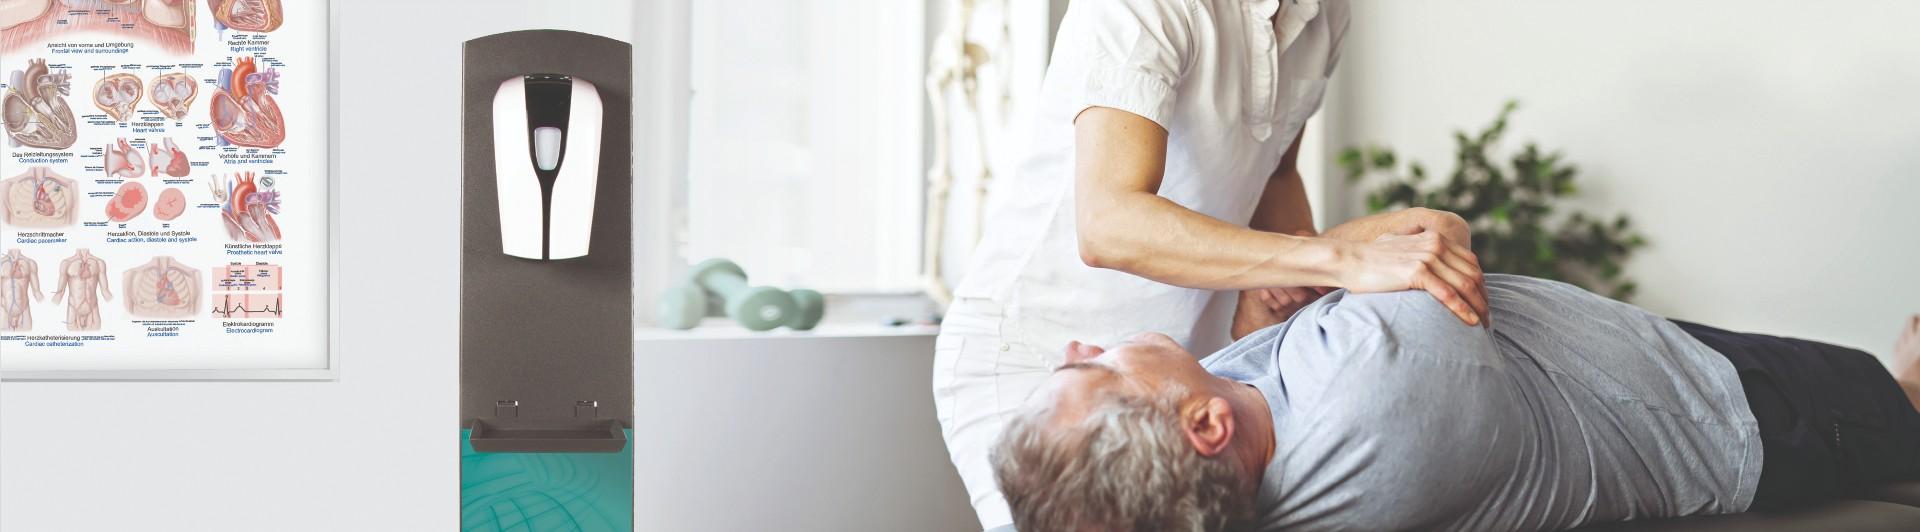 Physiotherapie-Bedarf